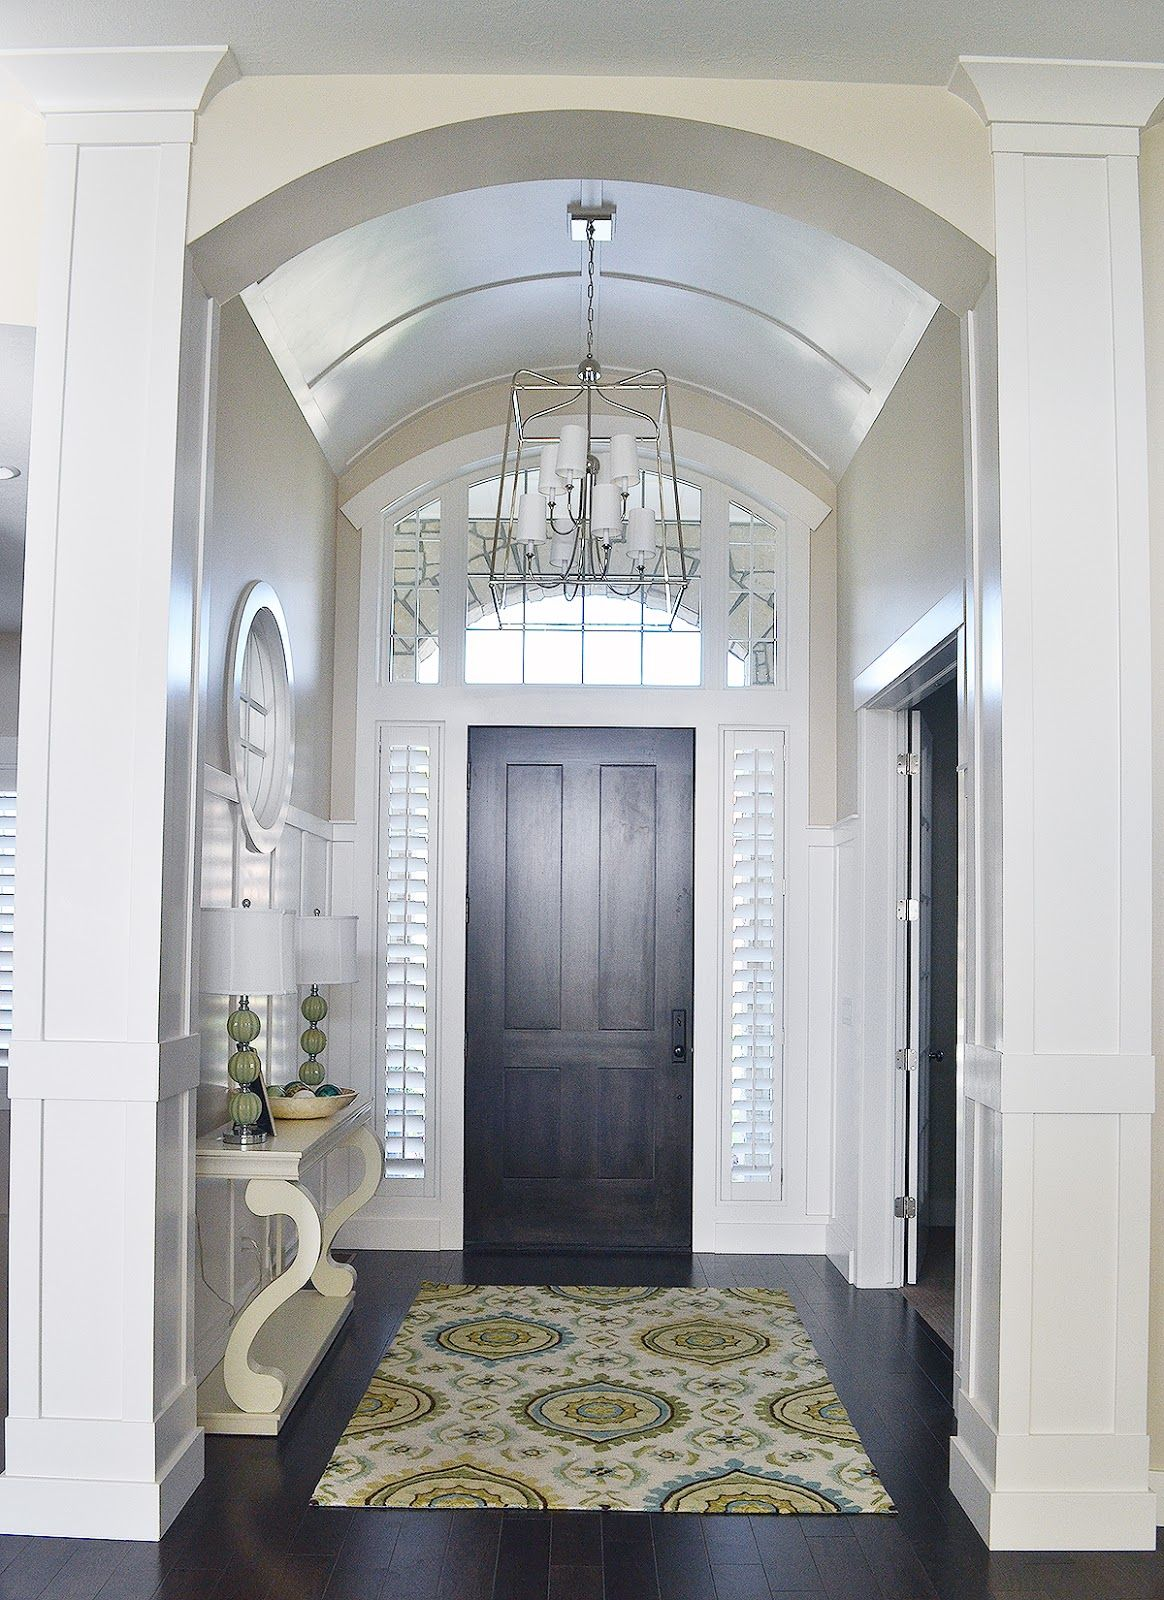 Sita Montgomery Interiors: S T A I R S + E N T R Y In